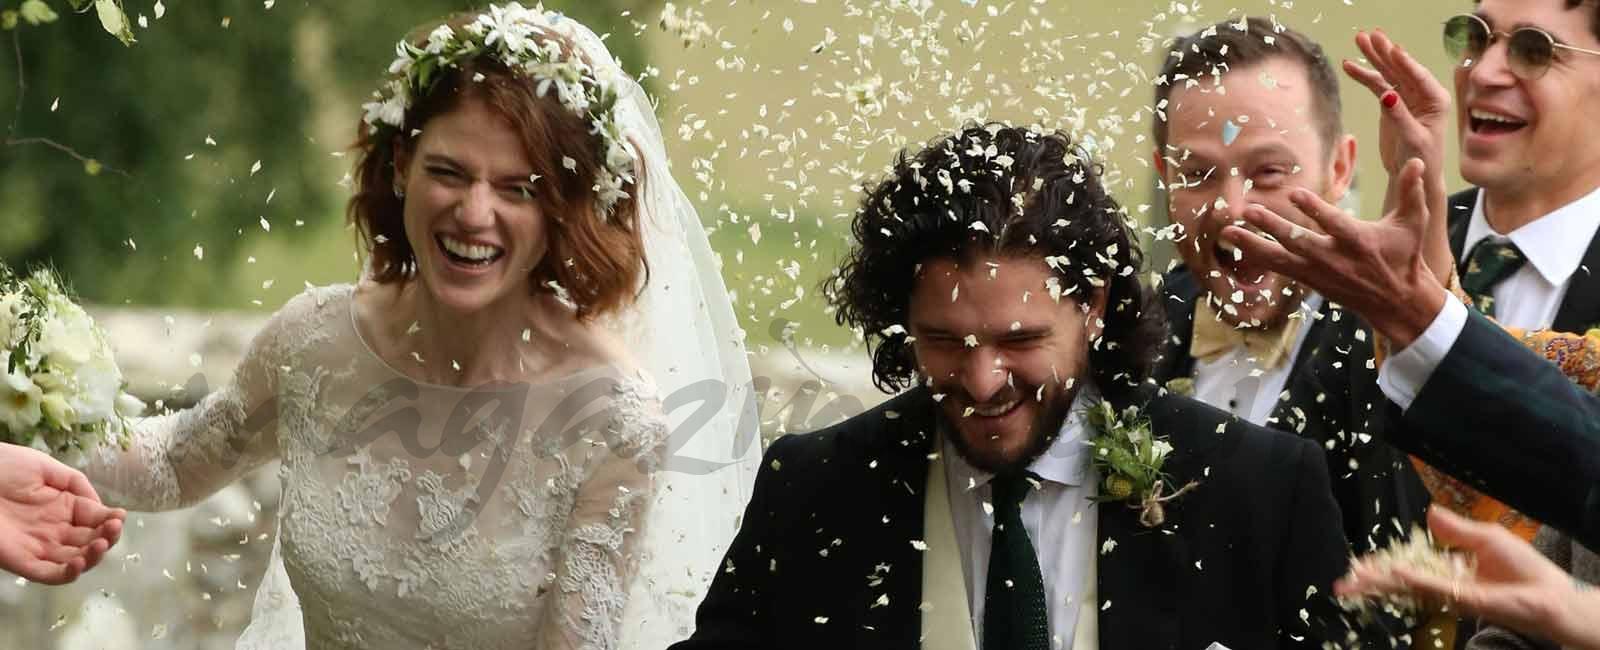 La romántica boda de Kit Harington y Rose Leslie